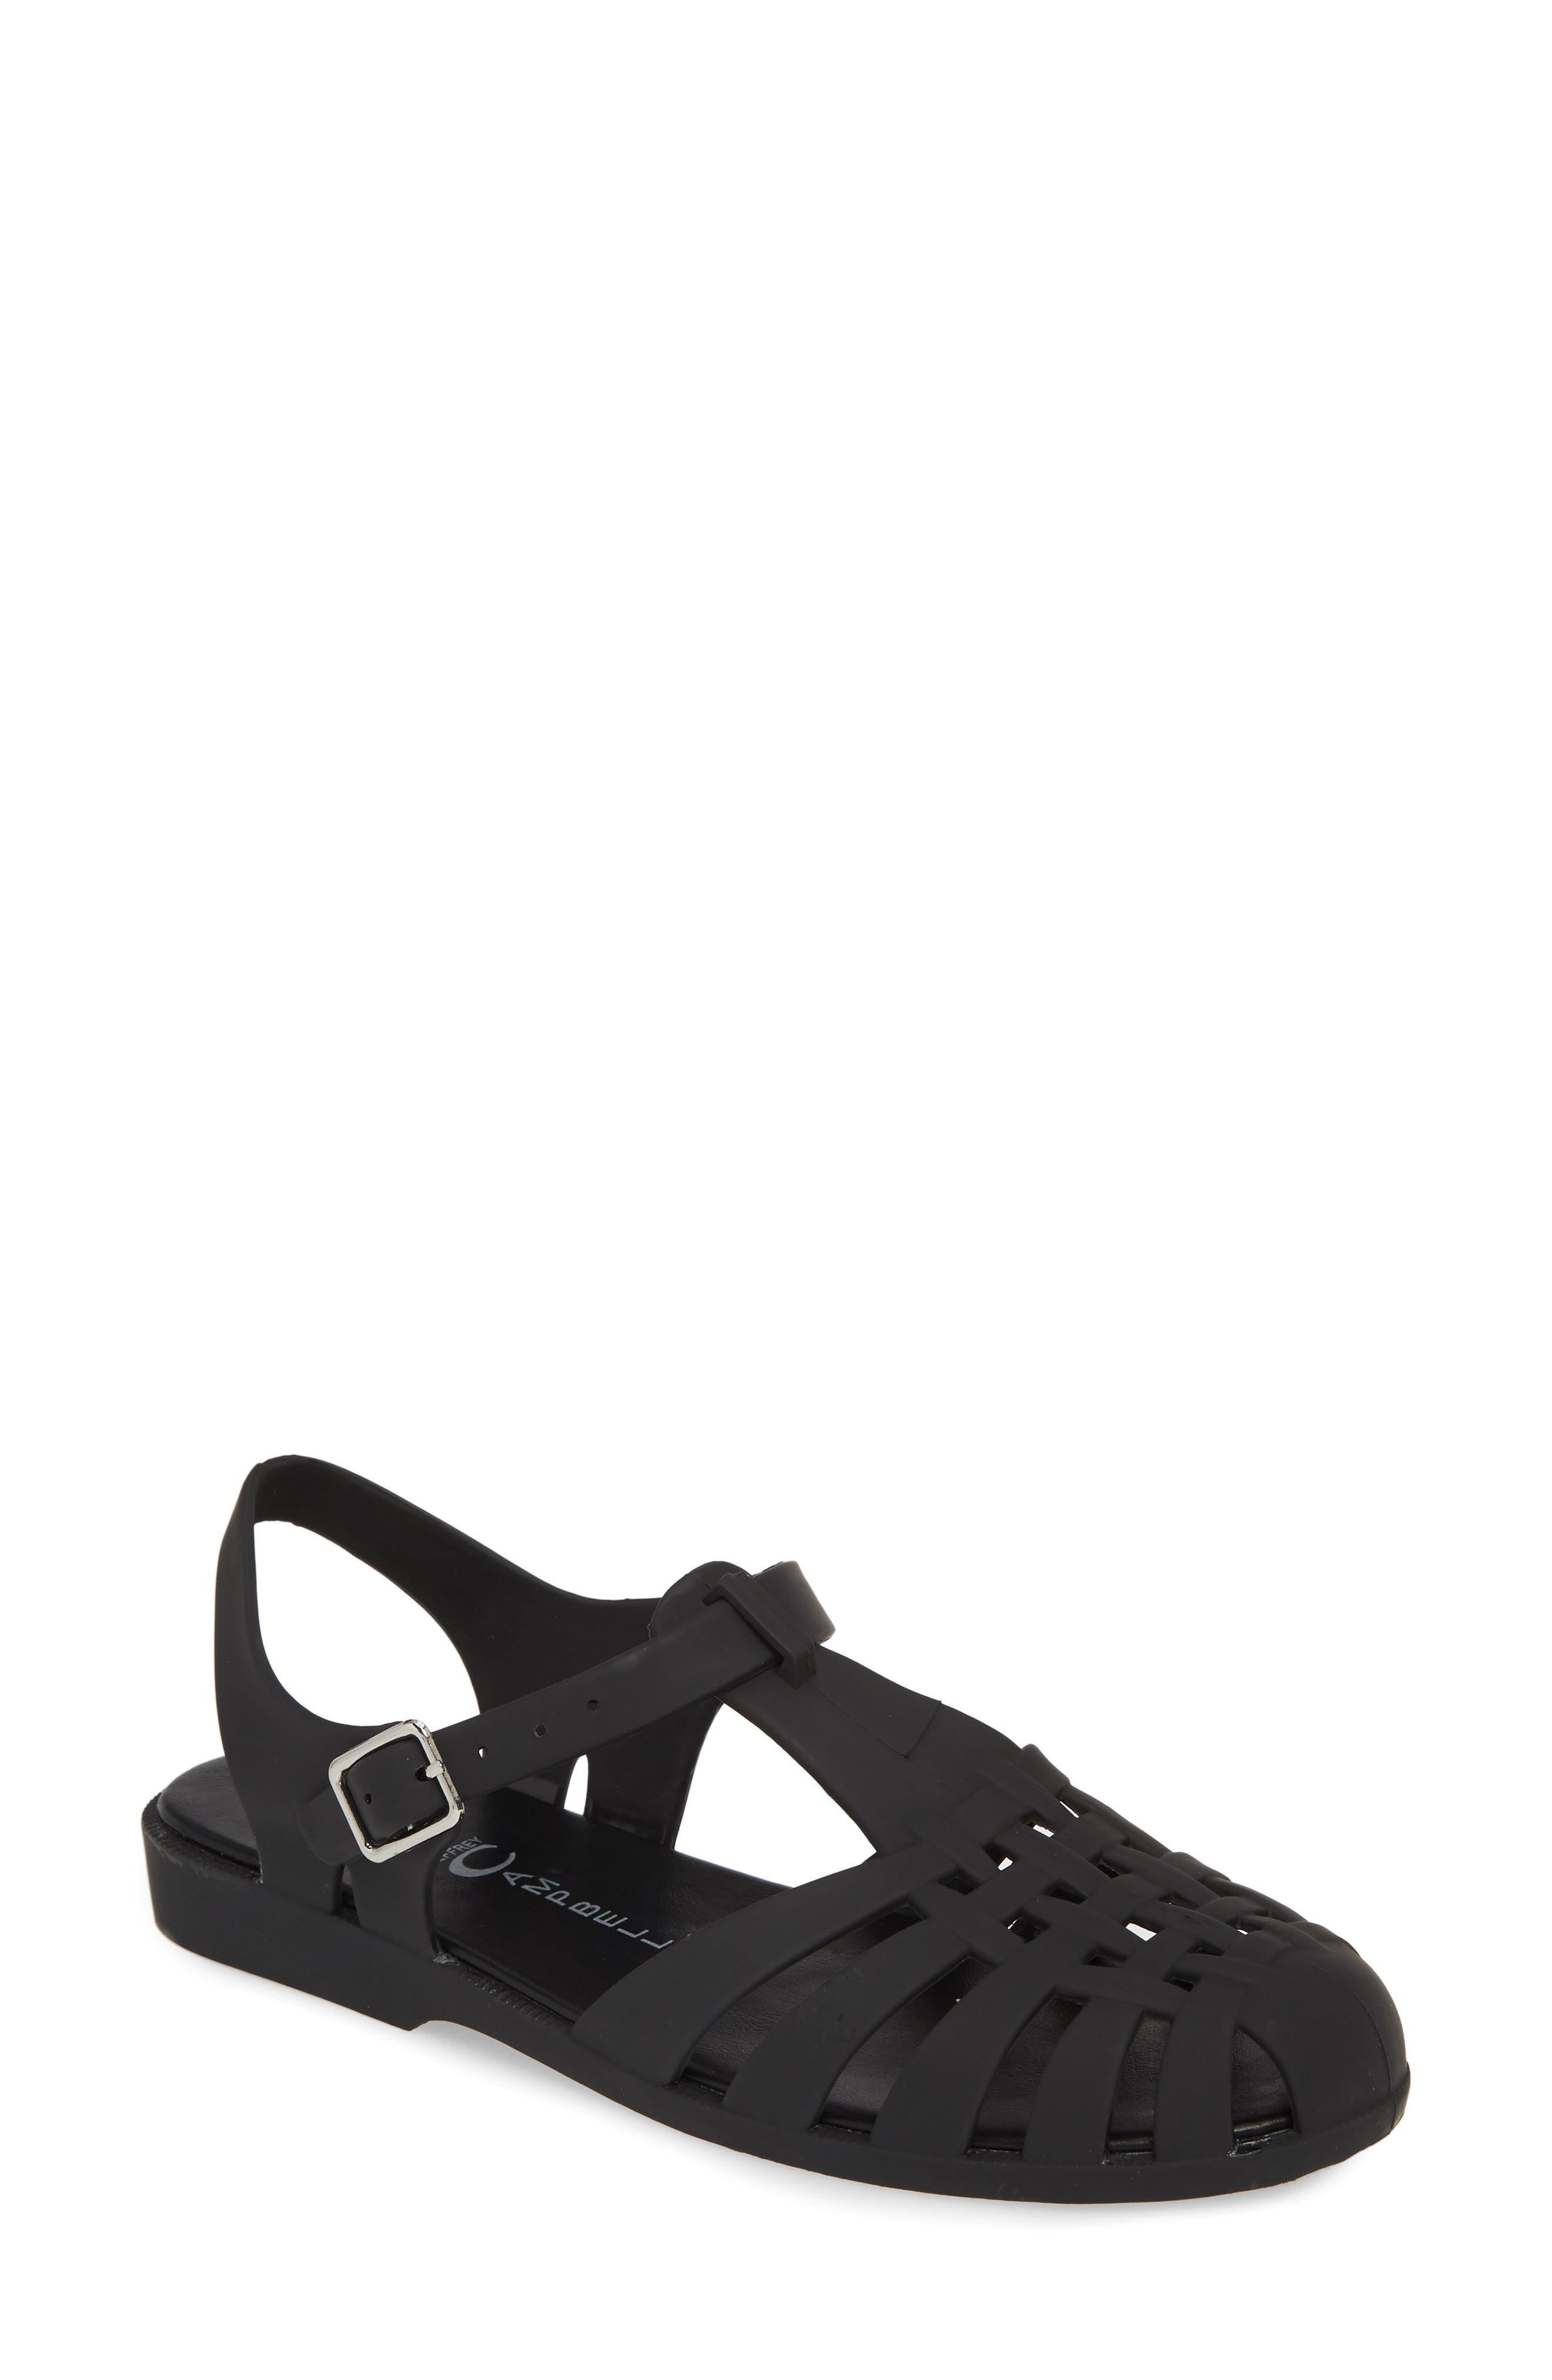 JEFFREY CAMPBELL Gelly Sandal, Main, color, BLACK MATTE